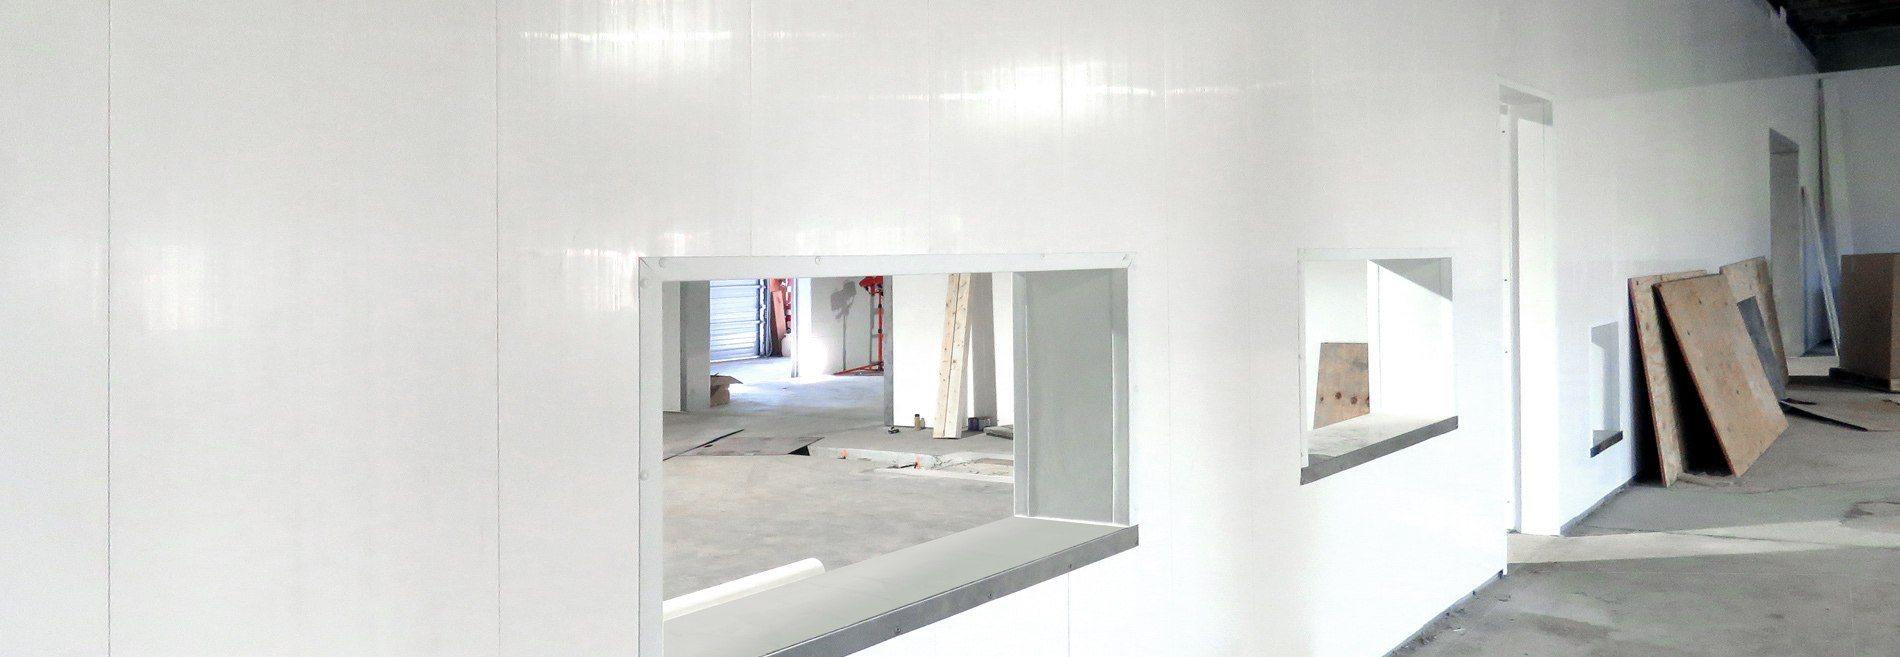 PVC Panel Interlocking Liners   DURACLAD   Palram Americas